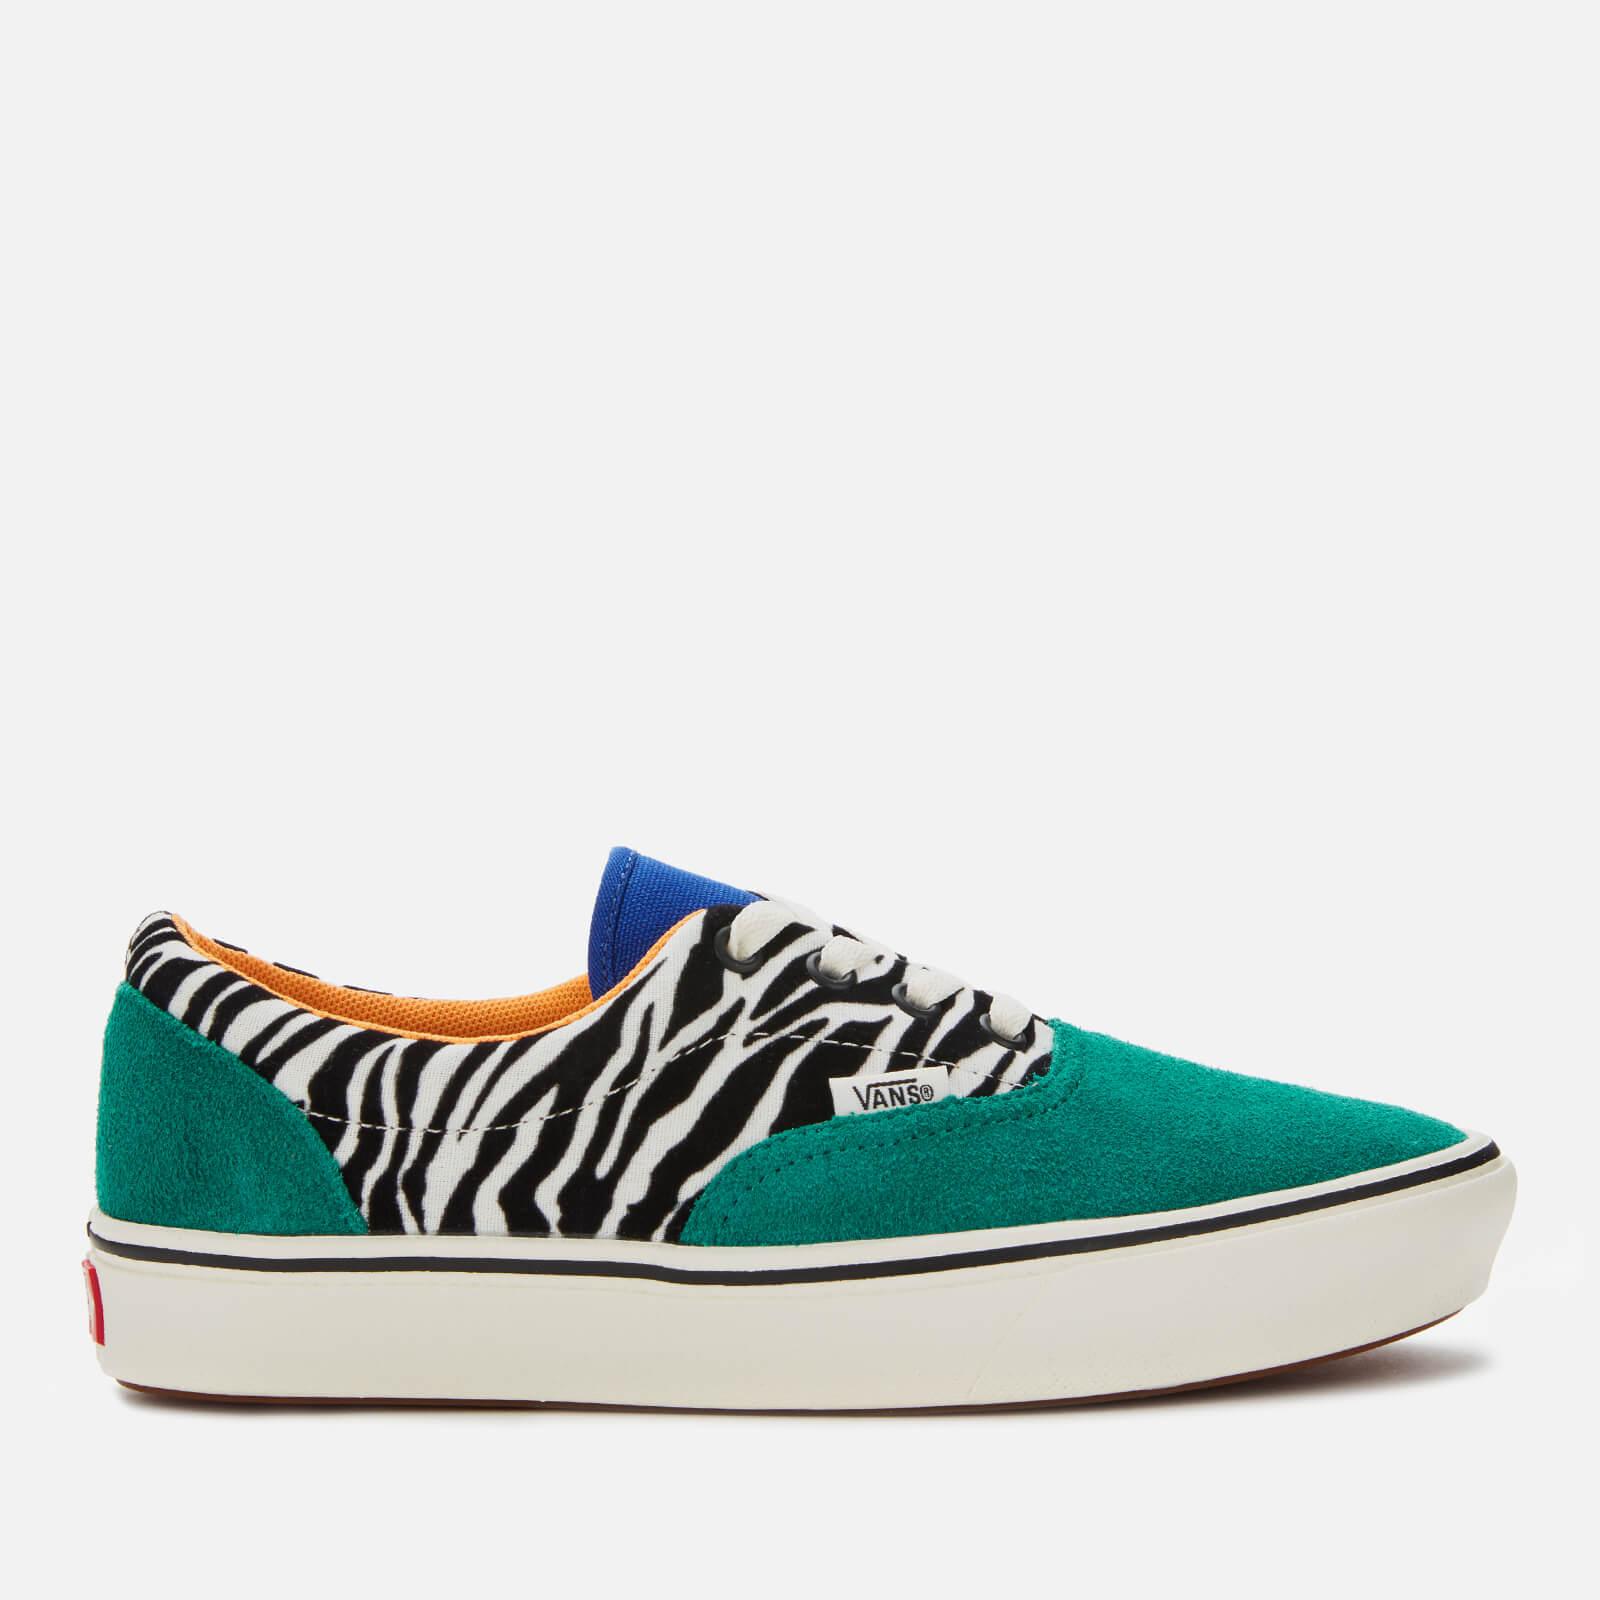 Vans ComfyCush Era Zebra Print Trainers - Tidepool/Surf The Web - UK 5 - Green/Multi